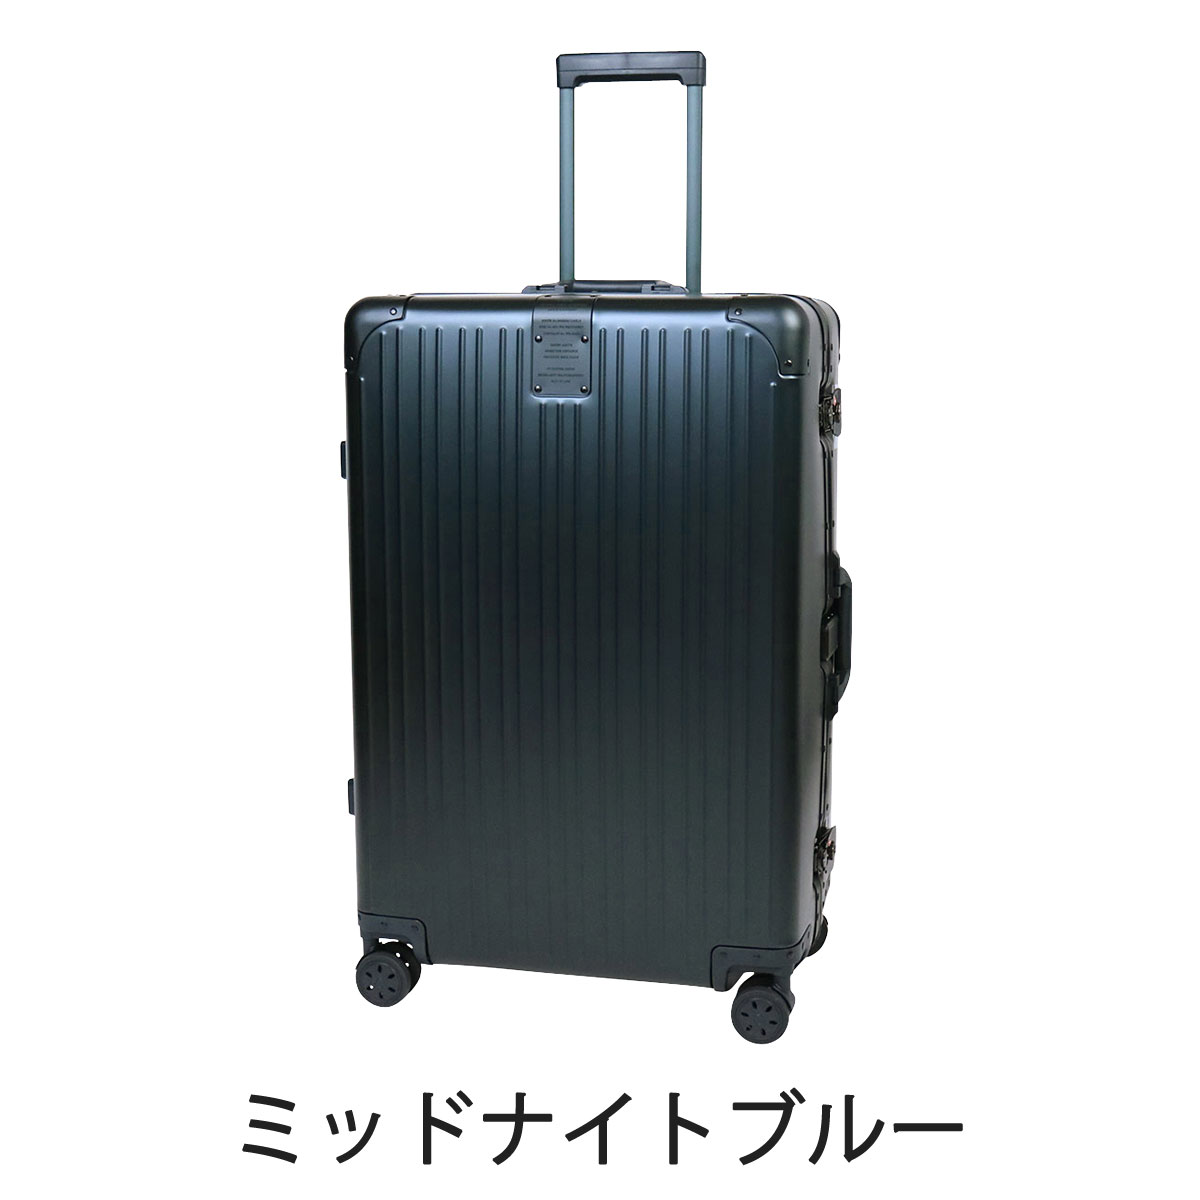 CARGO货物旅行箱三个一组TRIO JET SETTER飞翔距离情况旅行大型AMW128(L尺寸103L长期)